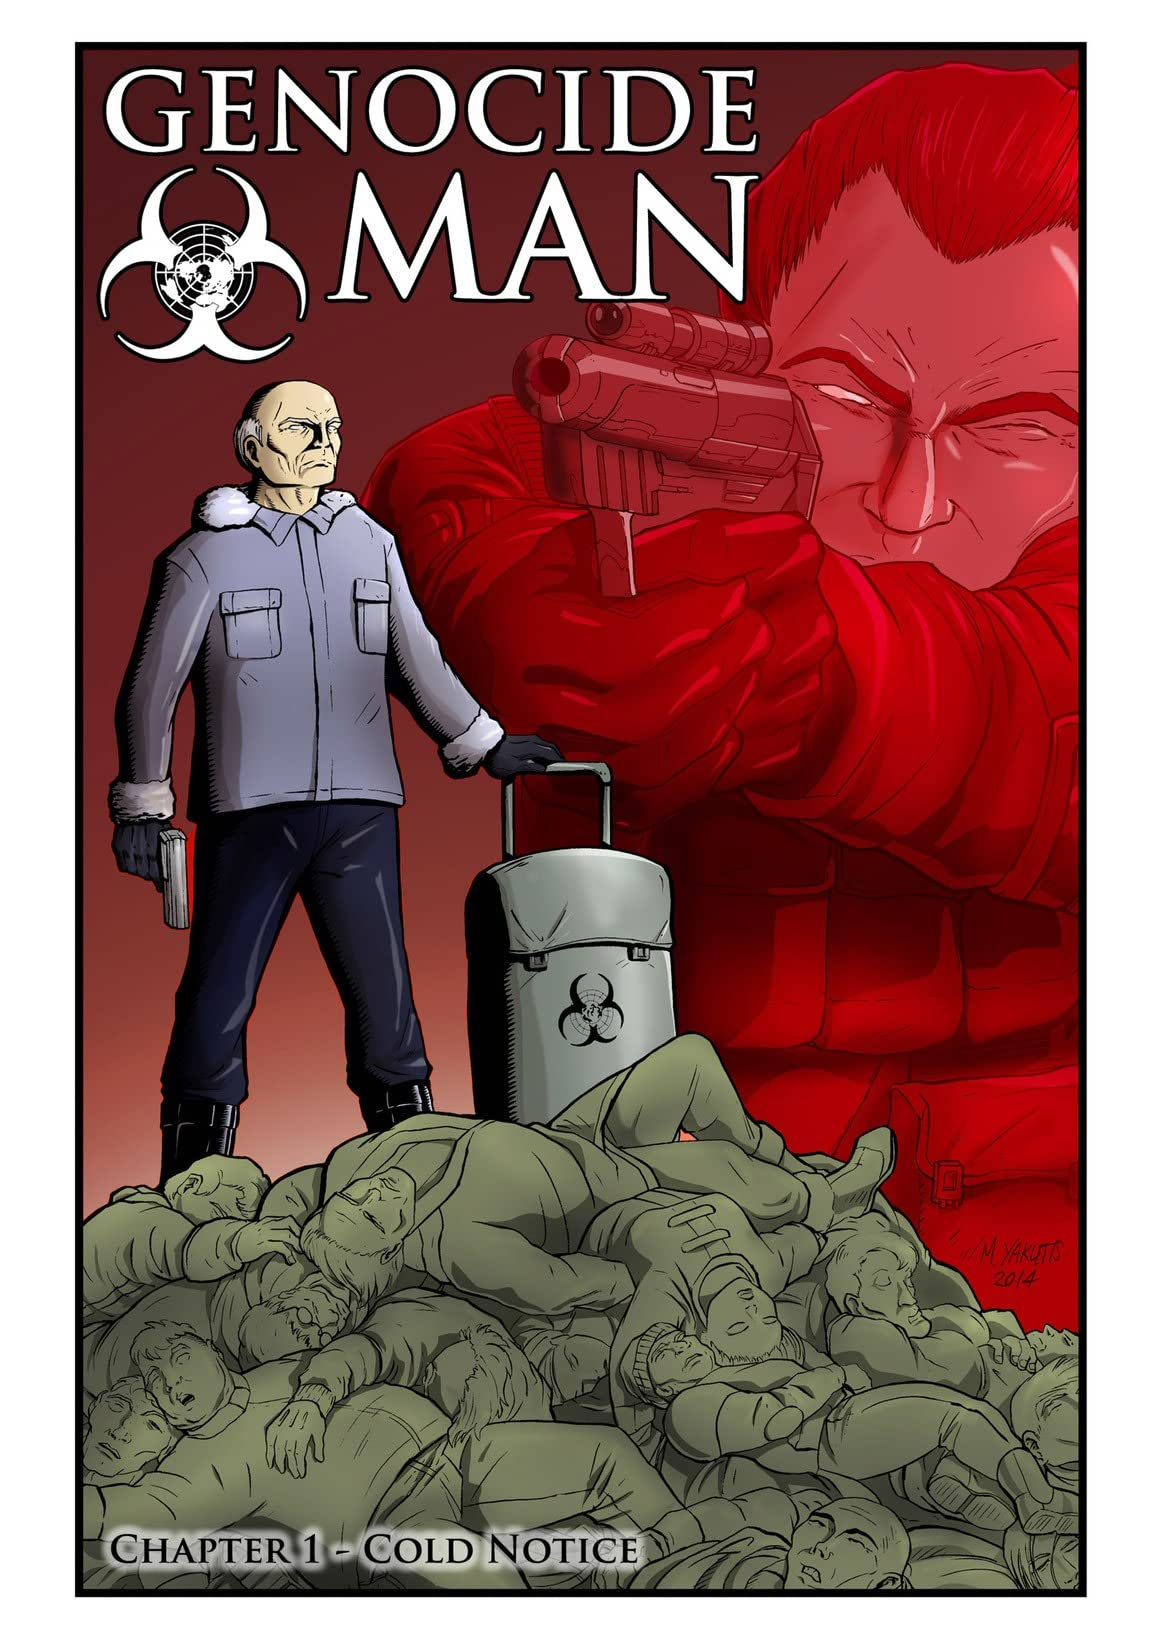 Genocide Man #1